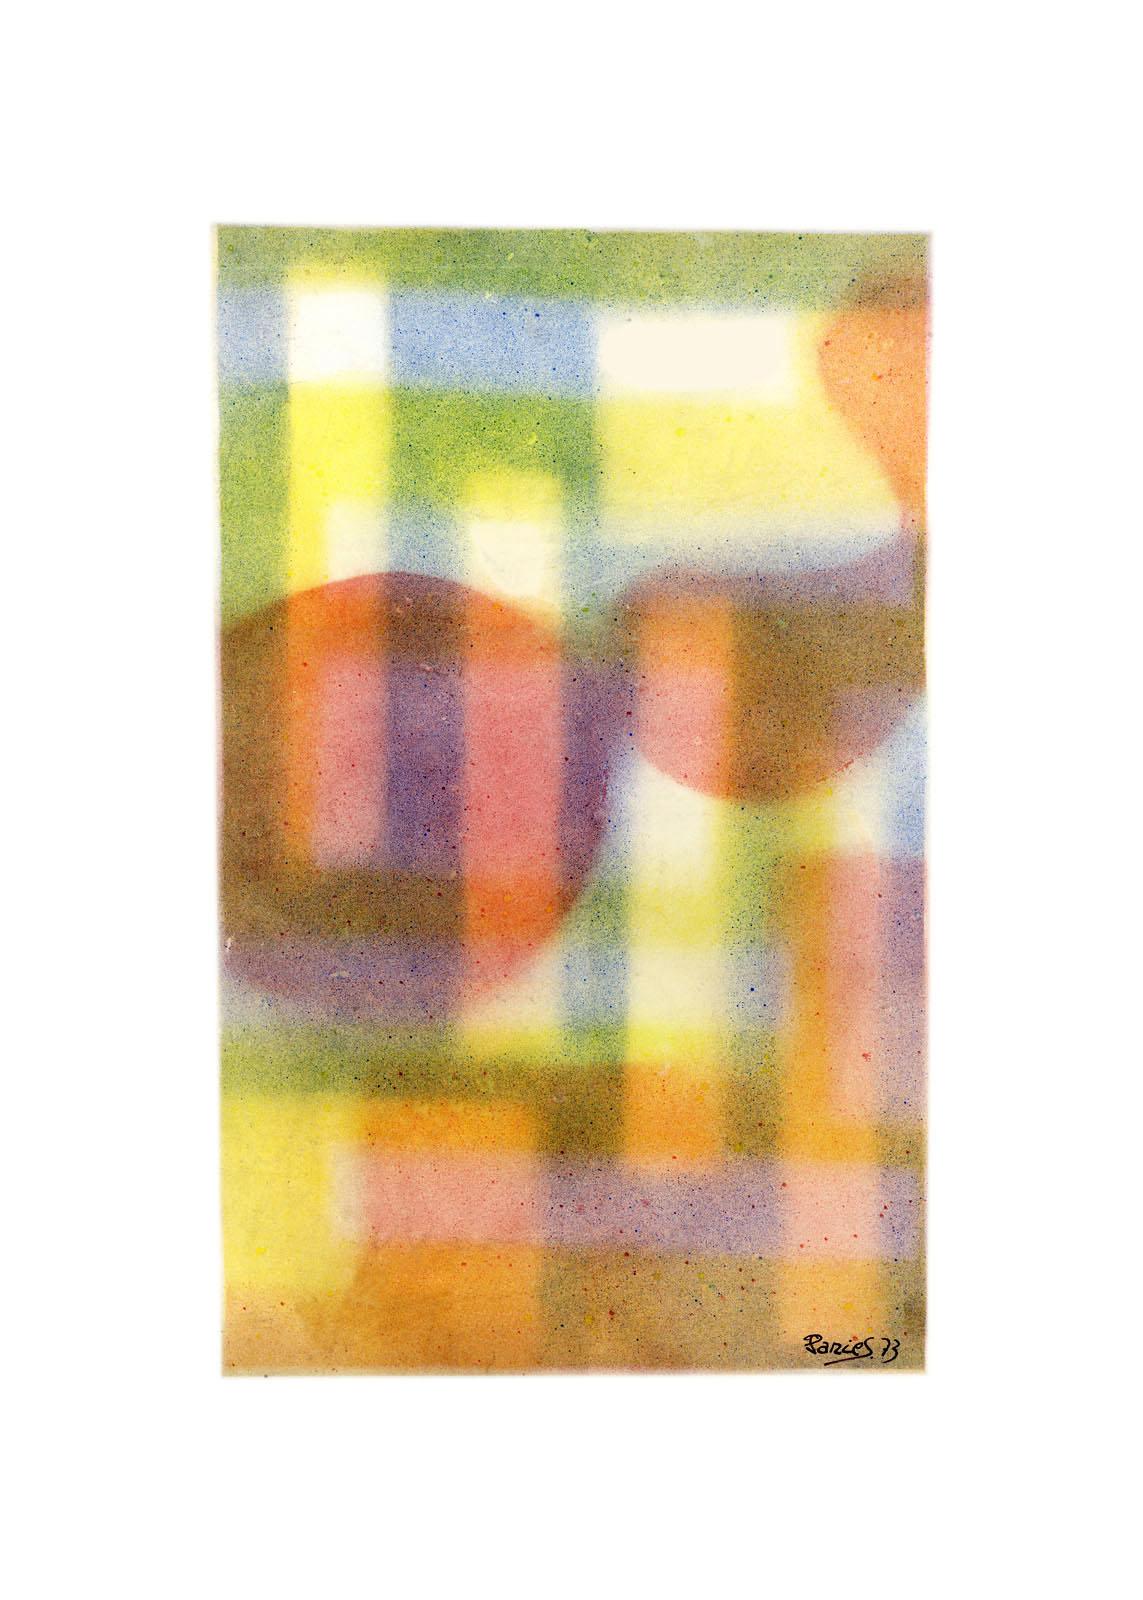 panies-danielvillalobos-spanish-painting-abstract-12